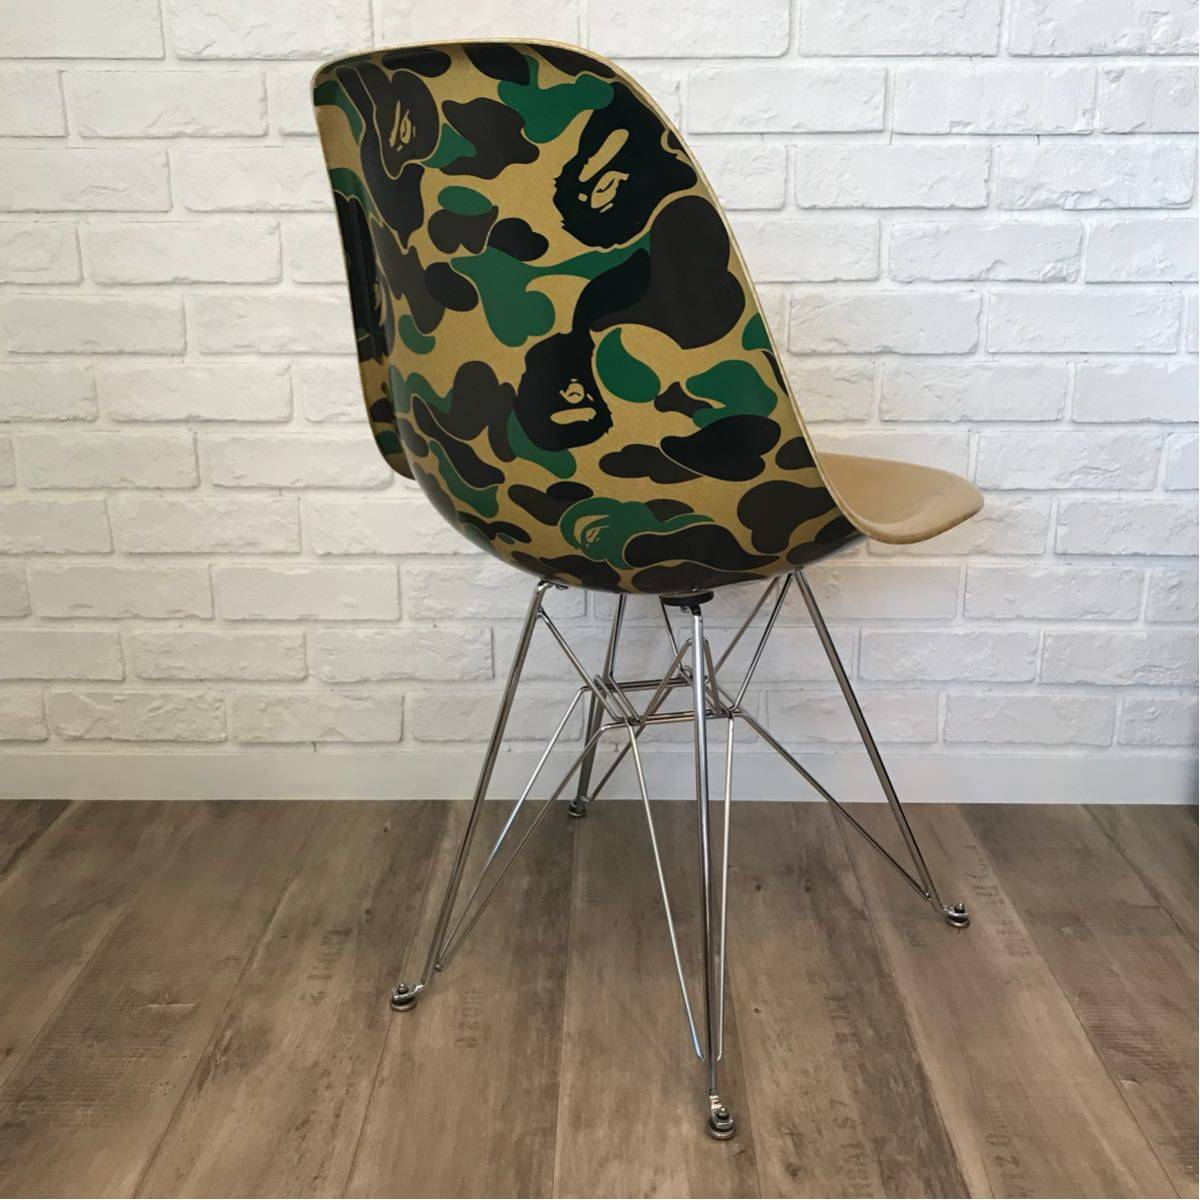 MODERNICA × BAPE CAMO SIDE CHAIR green a bathing ape EAMES モダニカ イームズ チェア ABC CAMO case study shop furniture ベイプ